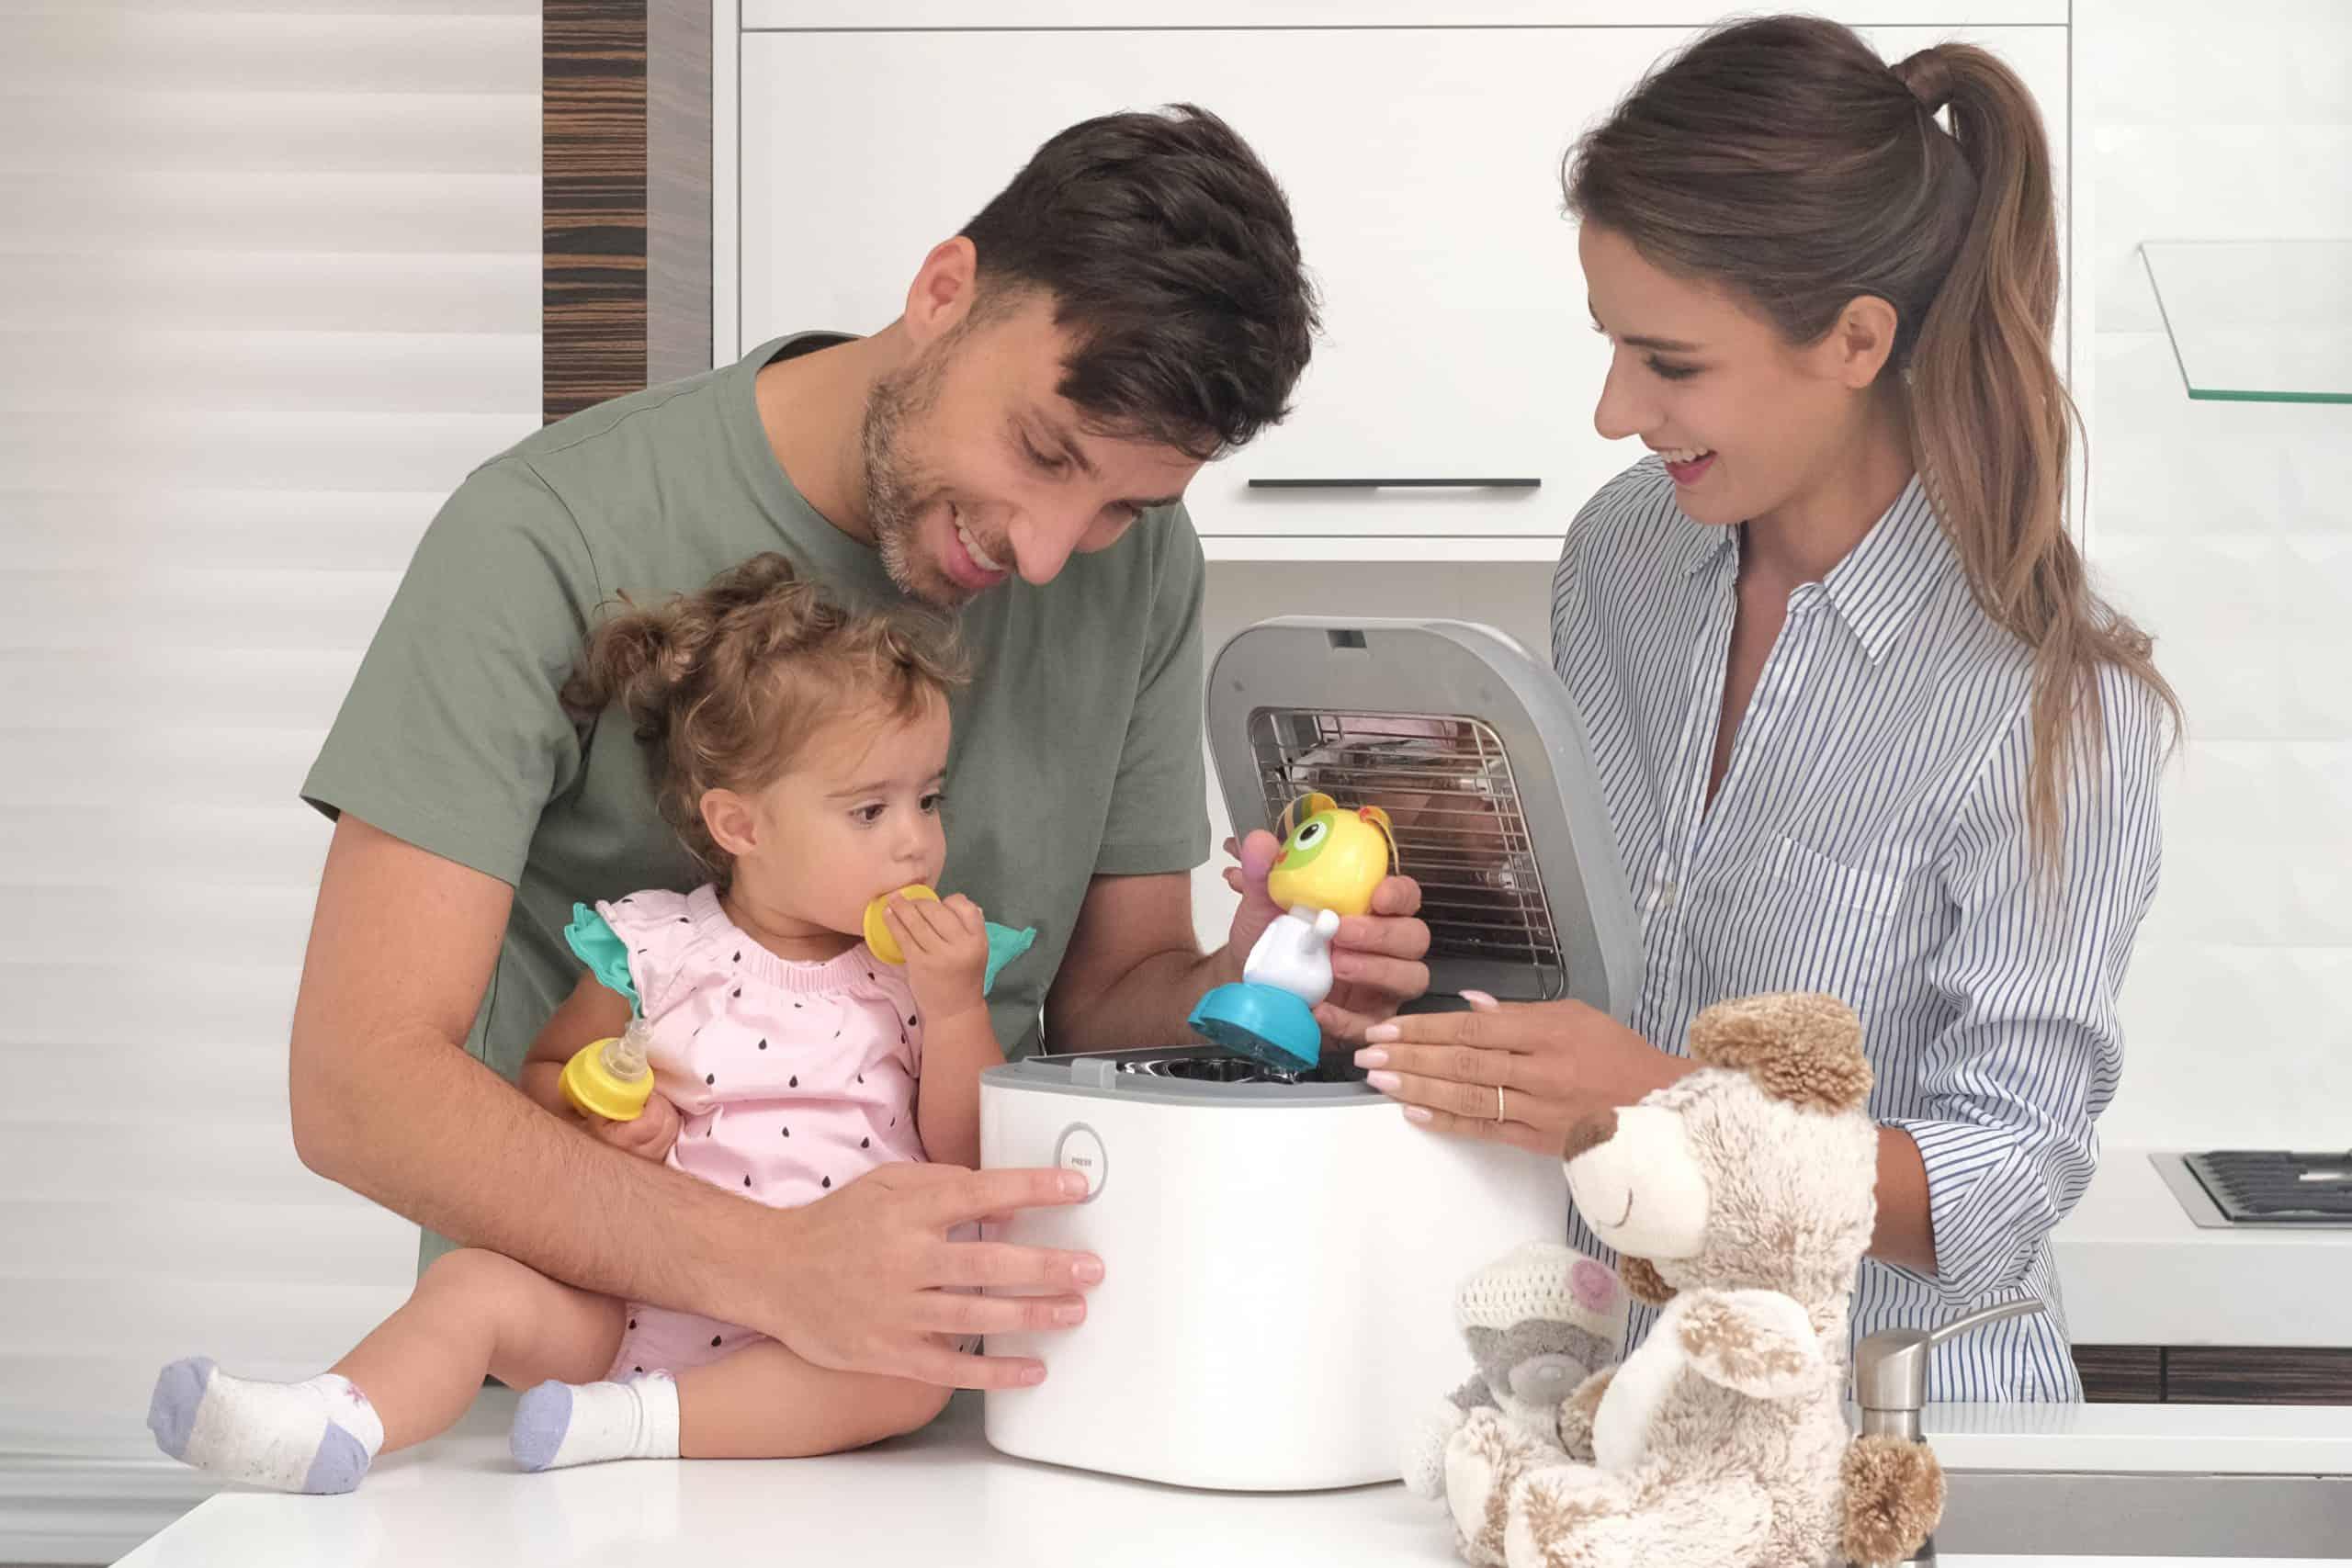 Coral UV Sanitizer a top tech gift